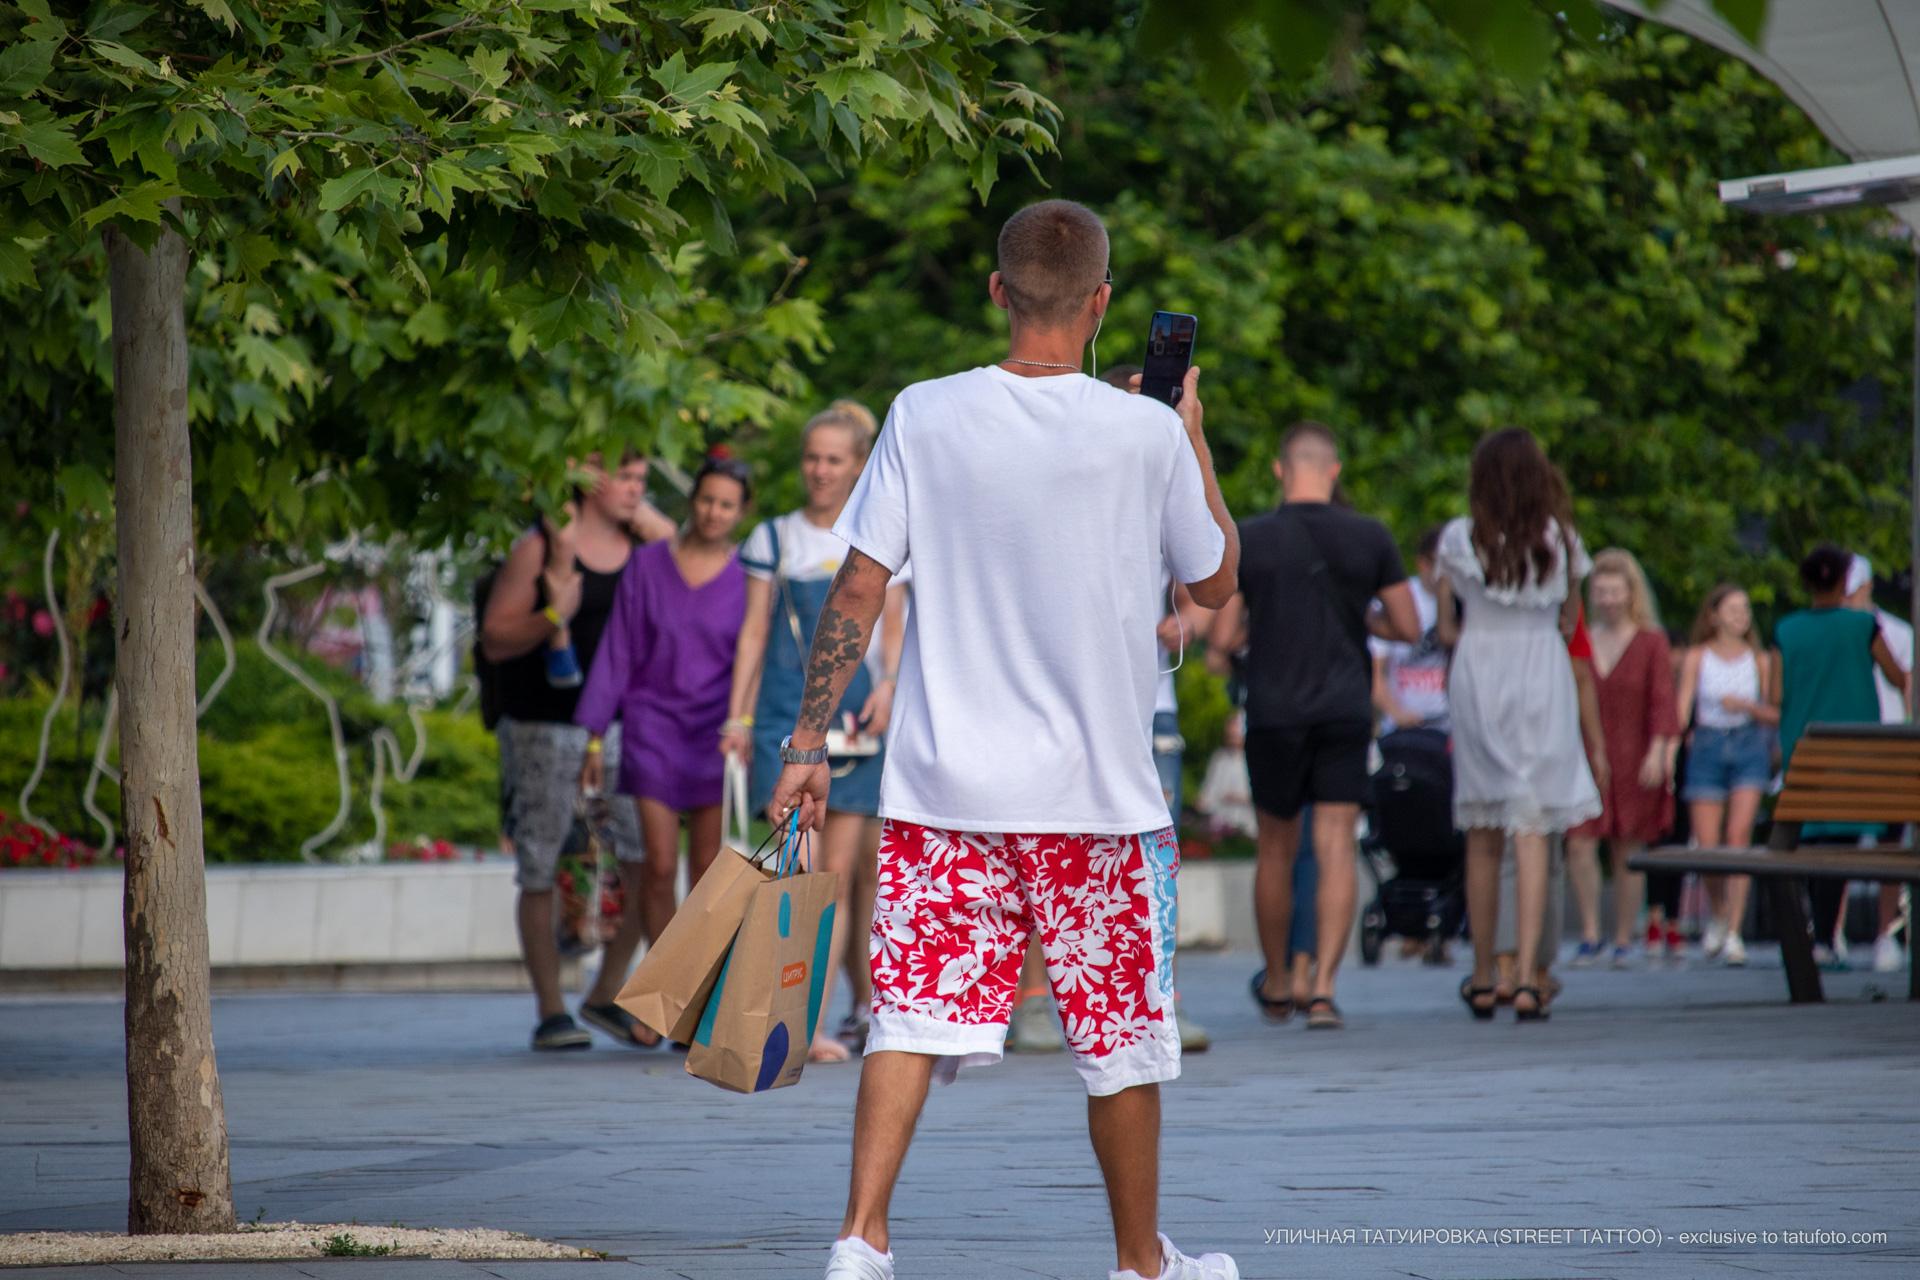 Фото тату с тучками на руке парня - Уличная татуировка (street tattoo) № 06 – 18.06.2020 – tatufoto.com 5